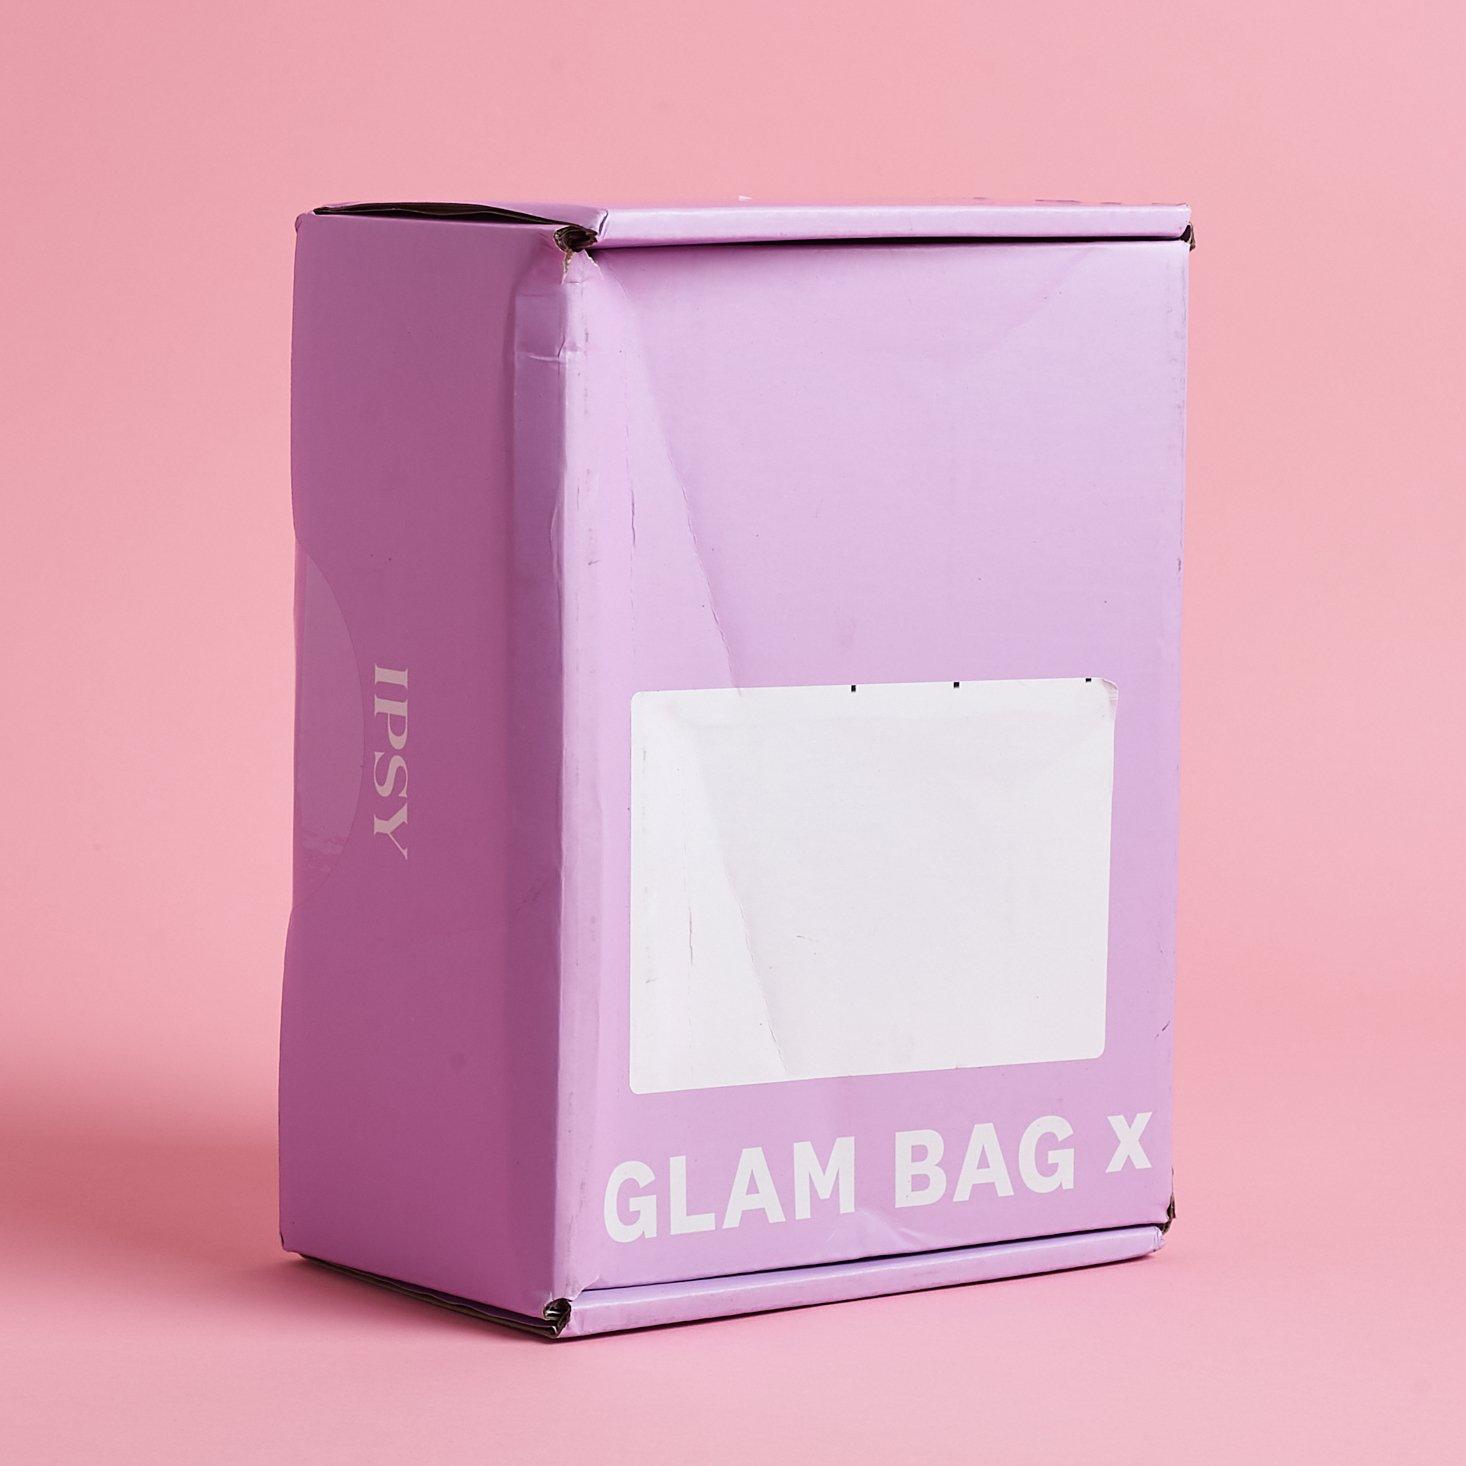 Ipsy Glam Bag X November 2021 Curator + Product Spoilers